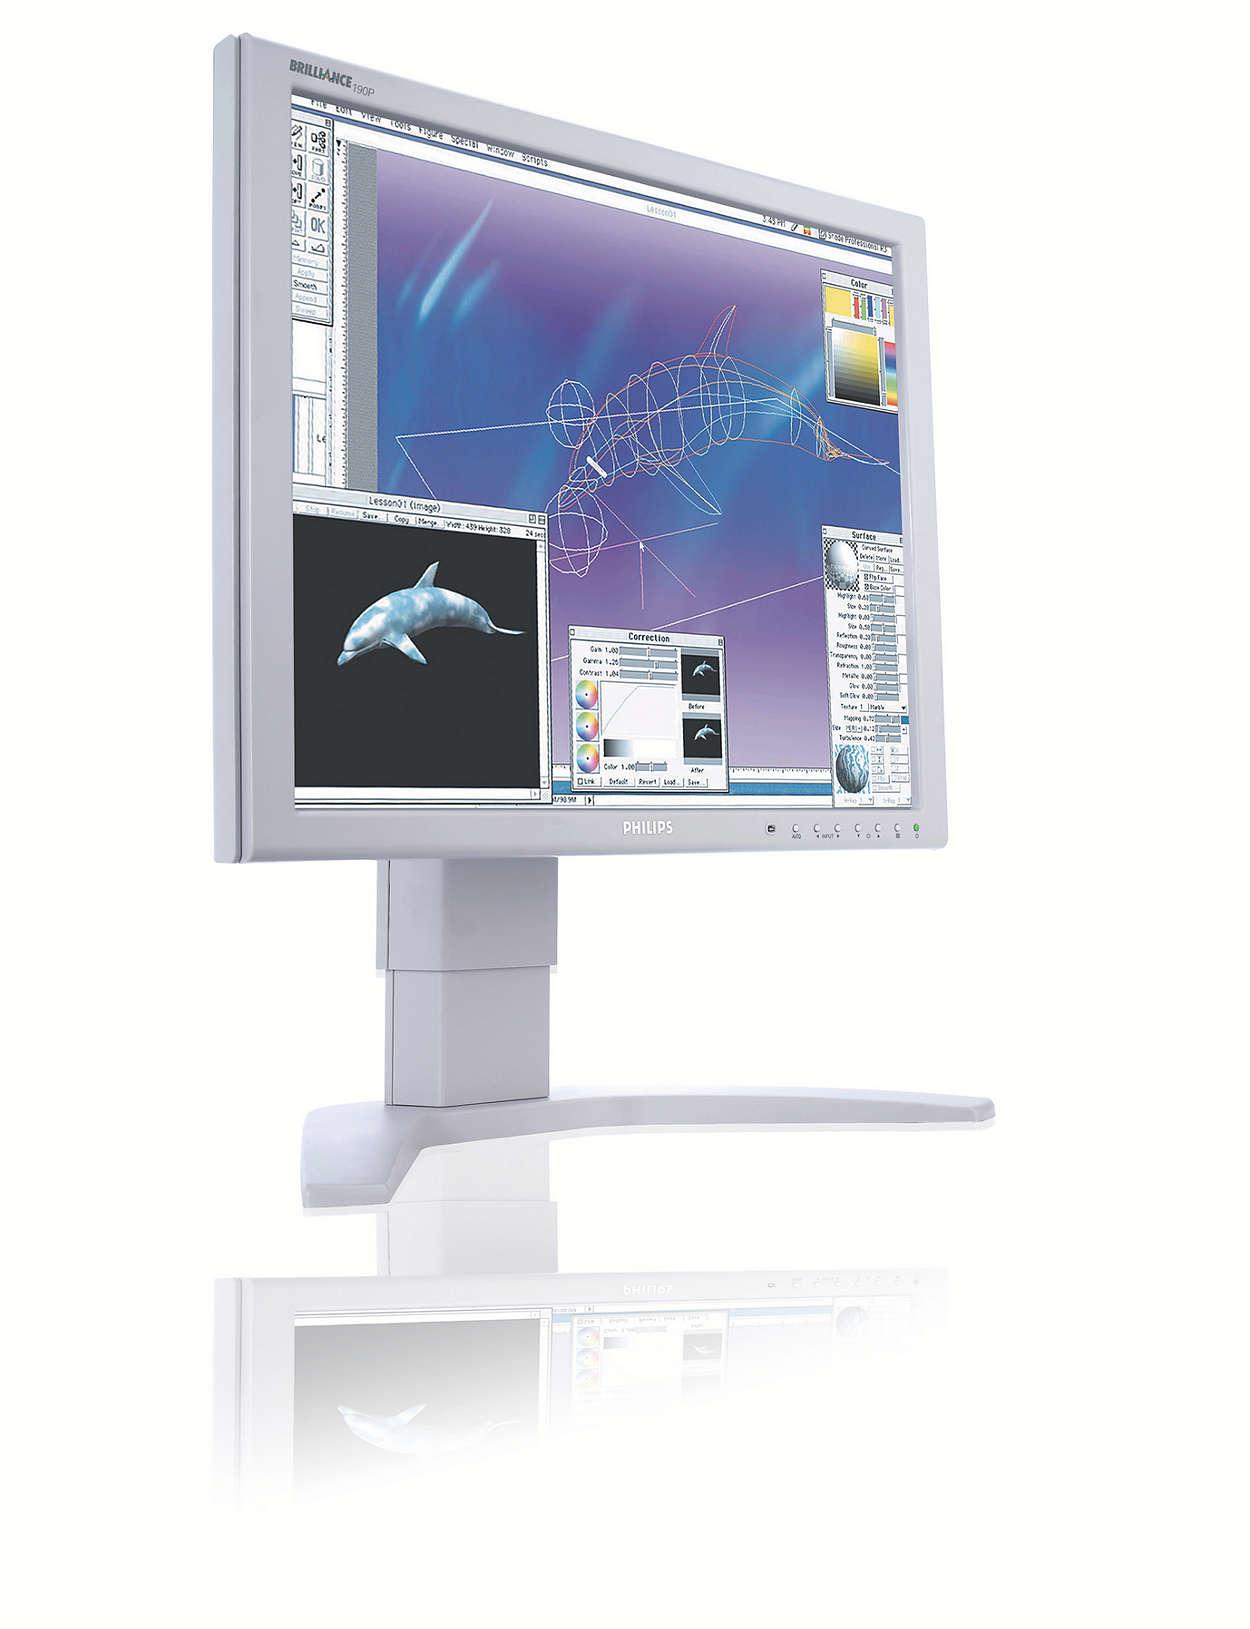 Super display designed for demanding professionals